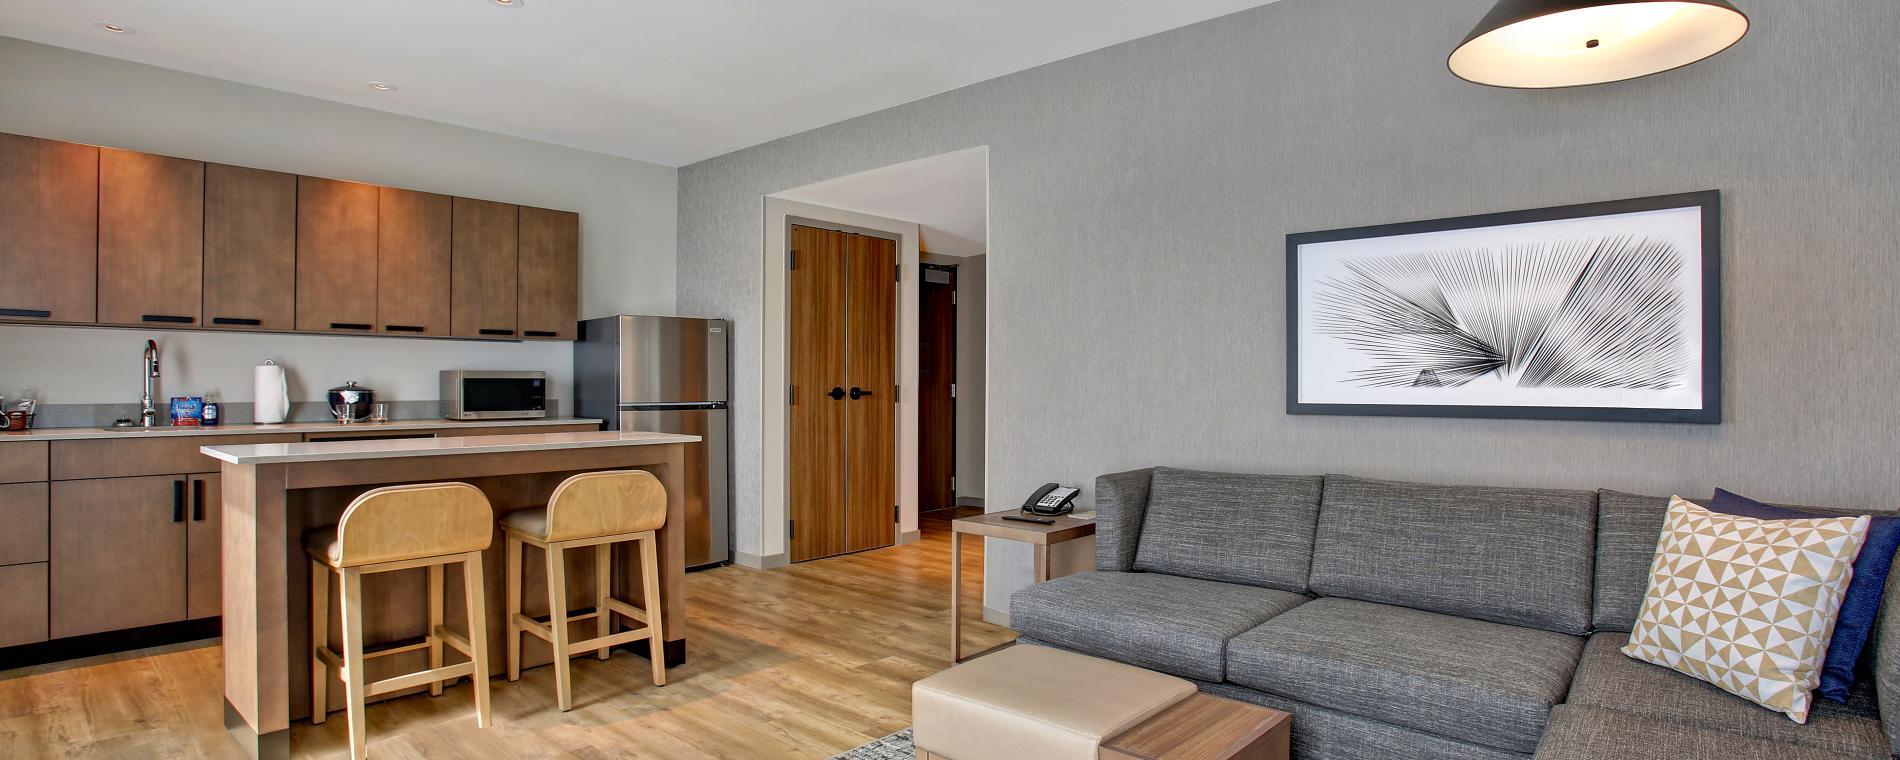 Suite Cozy Corner Hyatt Place partner provided Visit Wichita